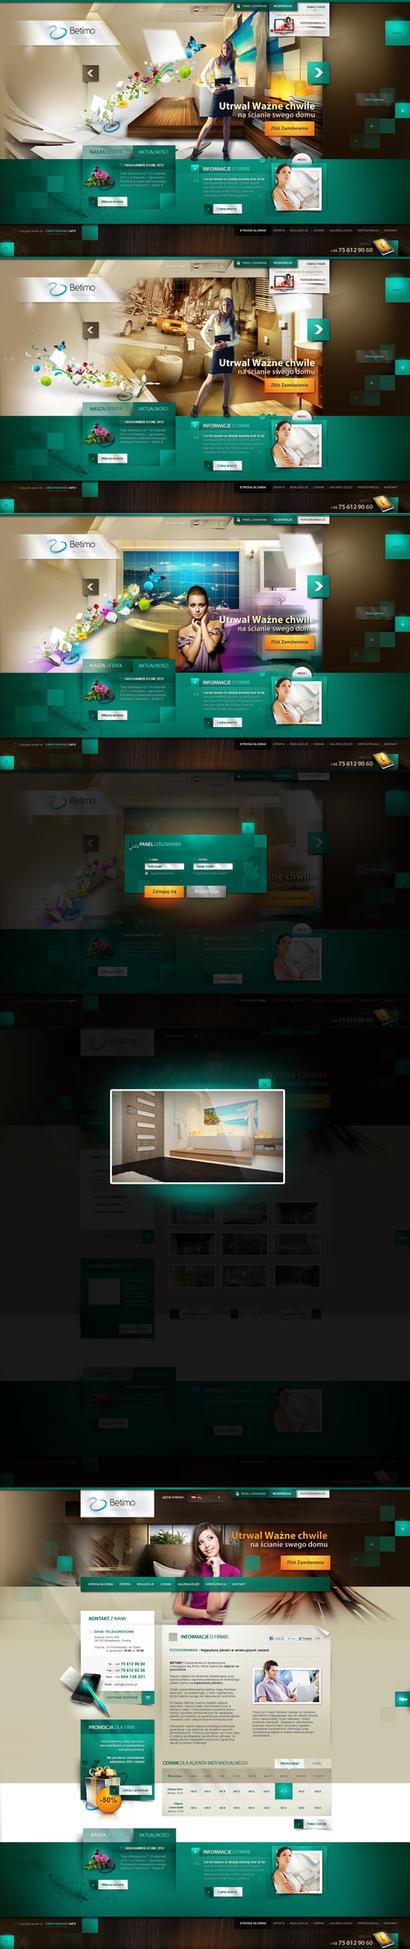 Betimo.pl - liquide website by webdesigner1921